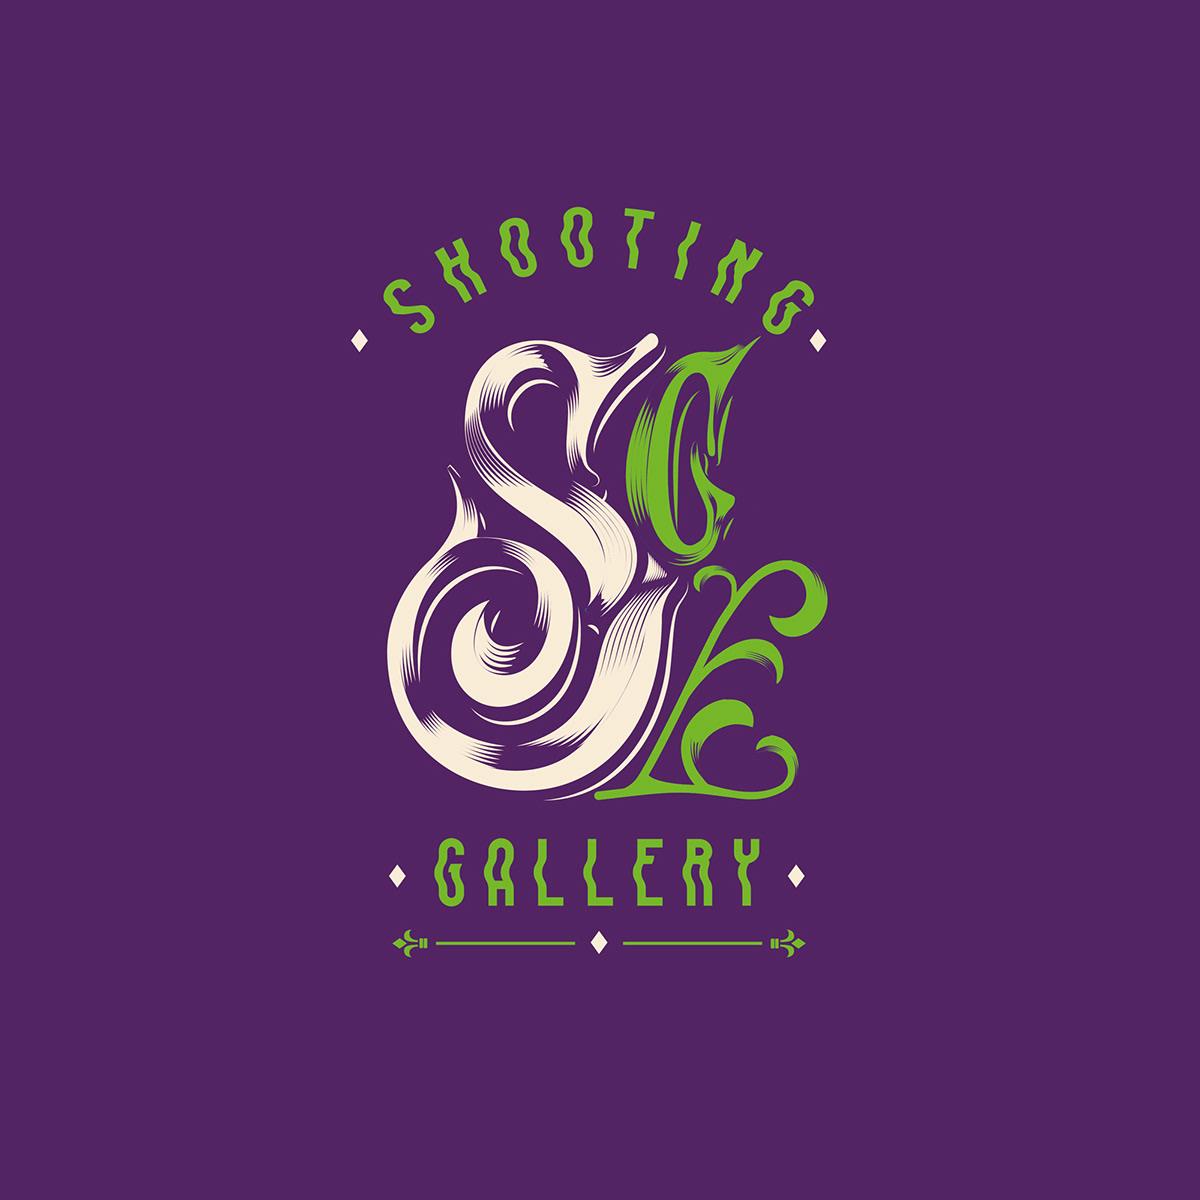 lettering inking Digital Art  horror fantasy Victorian Hitchcokc disney 80s Retro